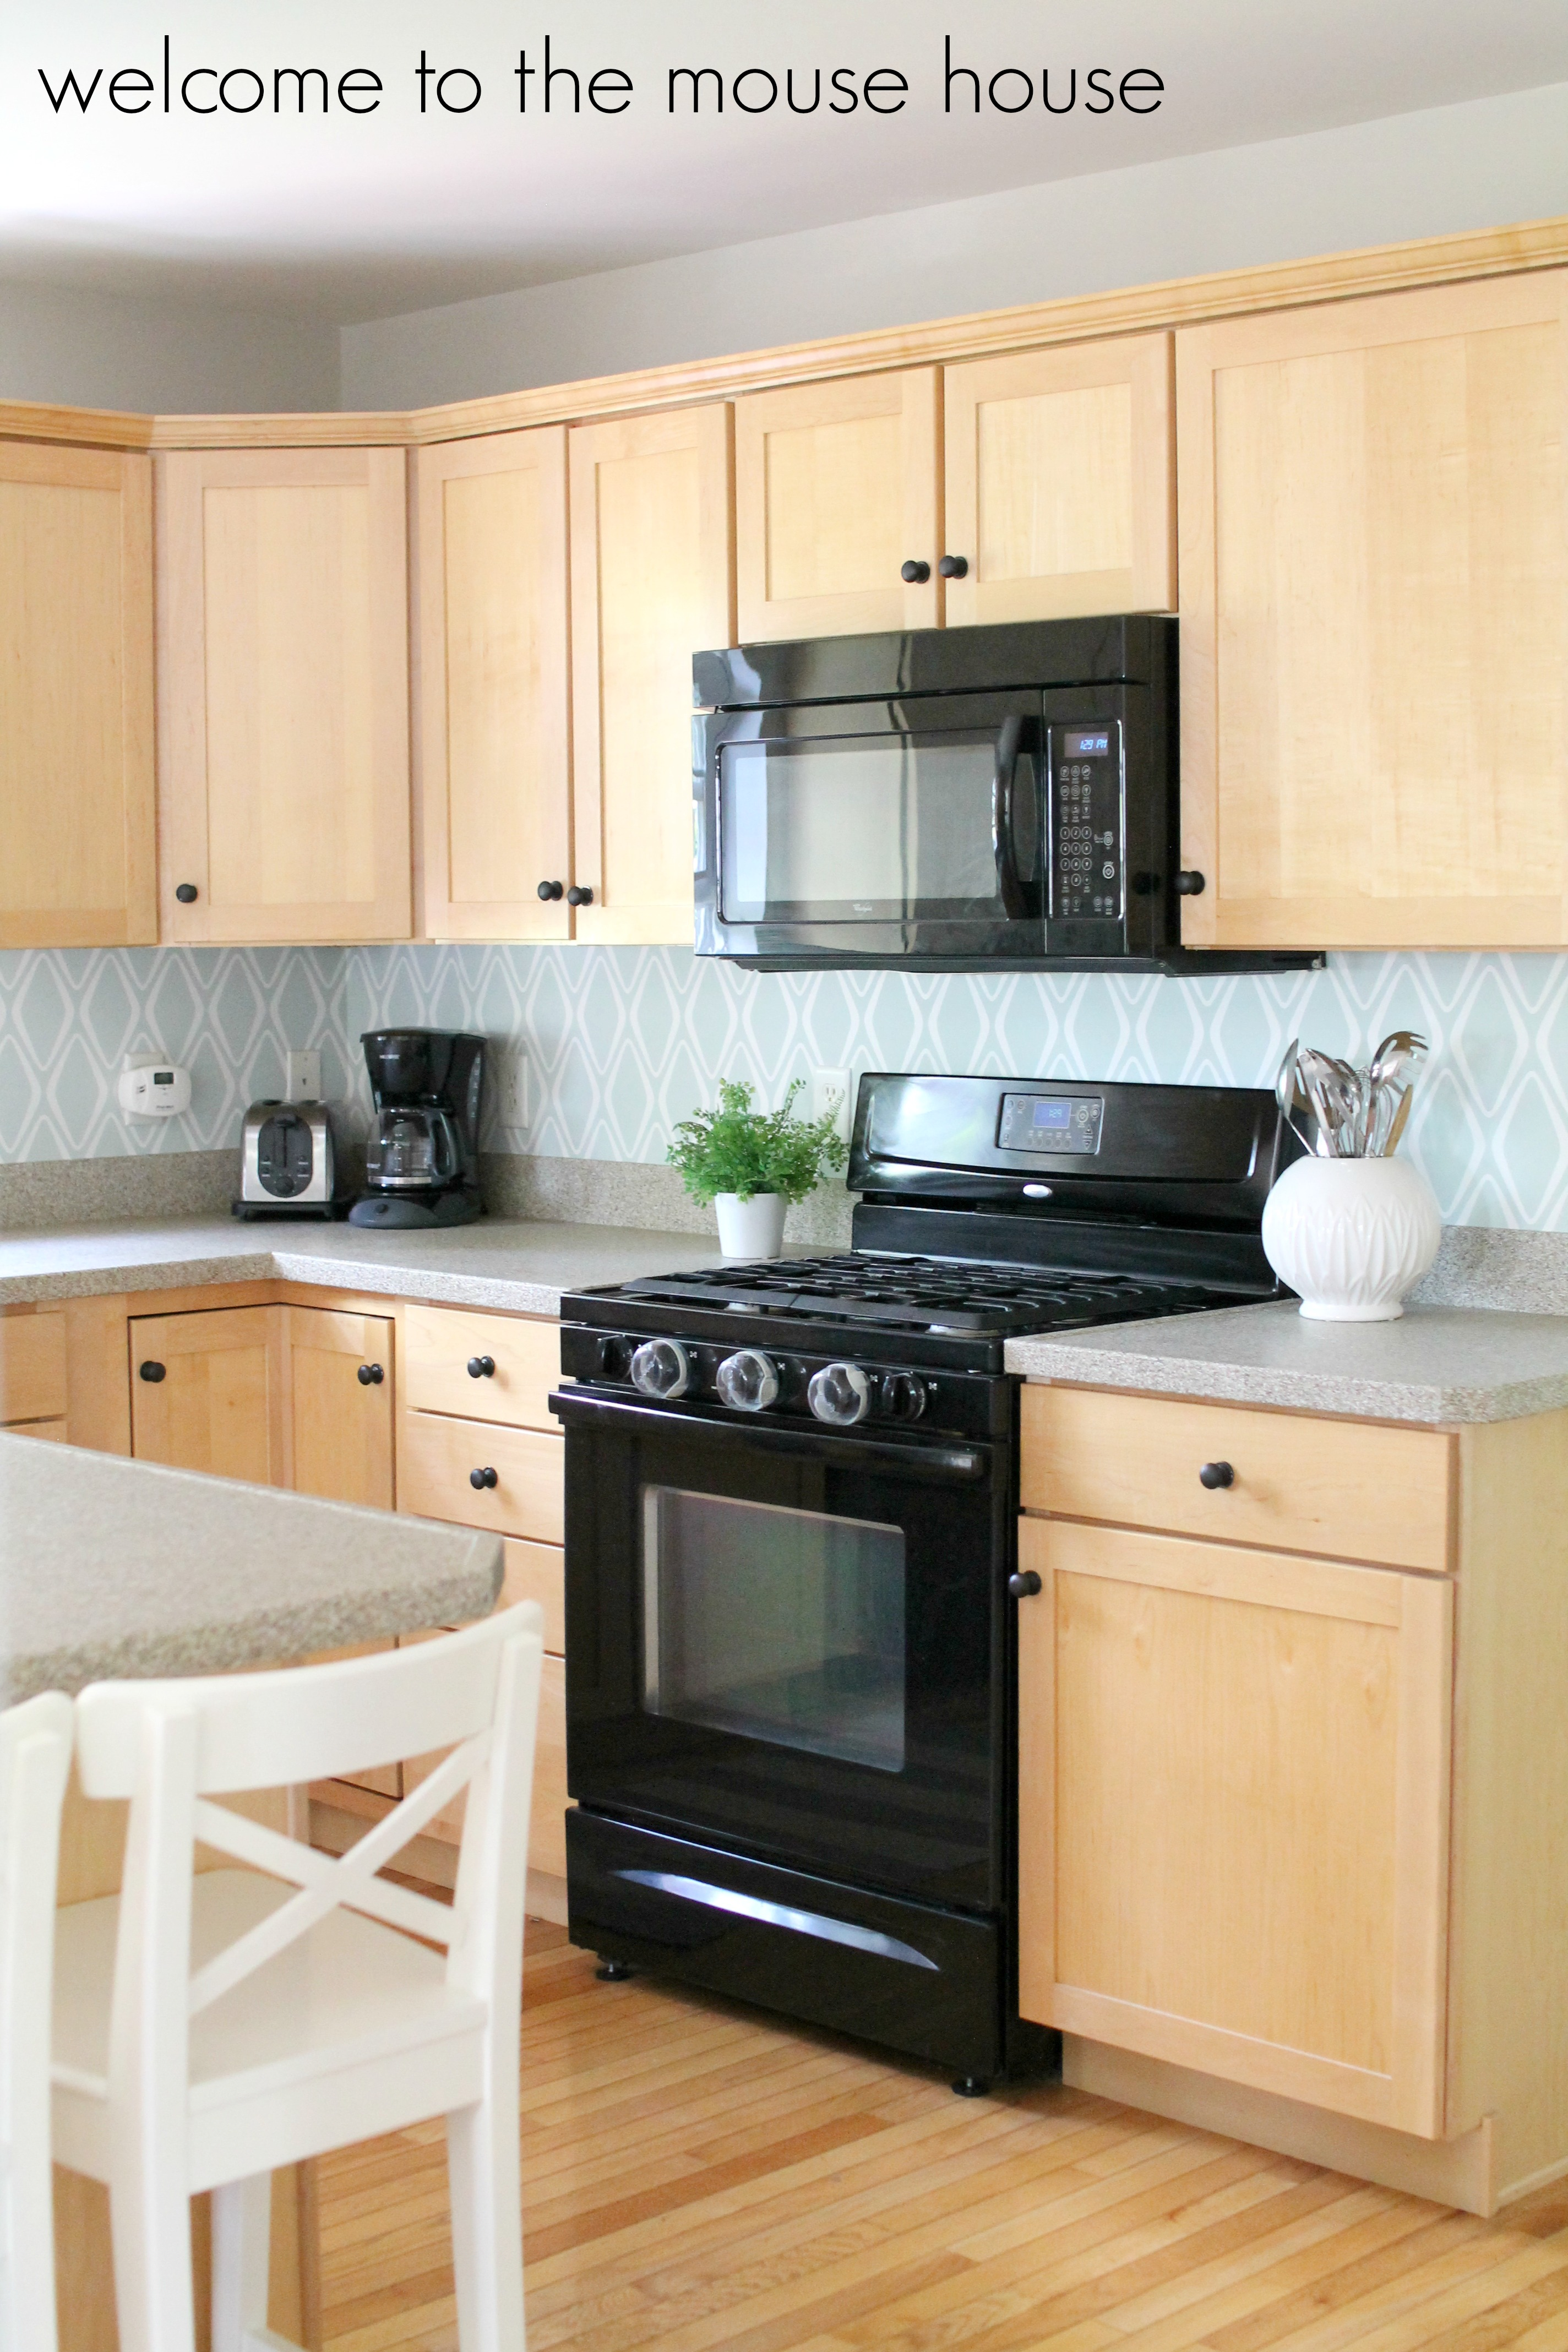 Easy Kitchen Backsplash 30 Target Wallpaper   welcometothemousehouse 2848x4272